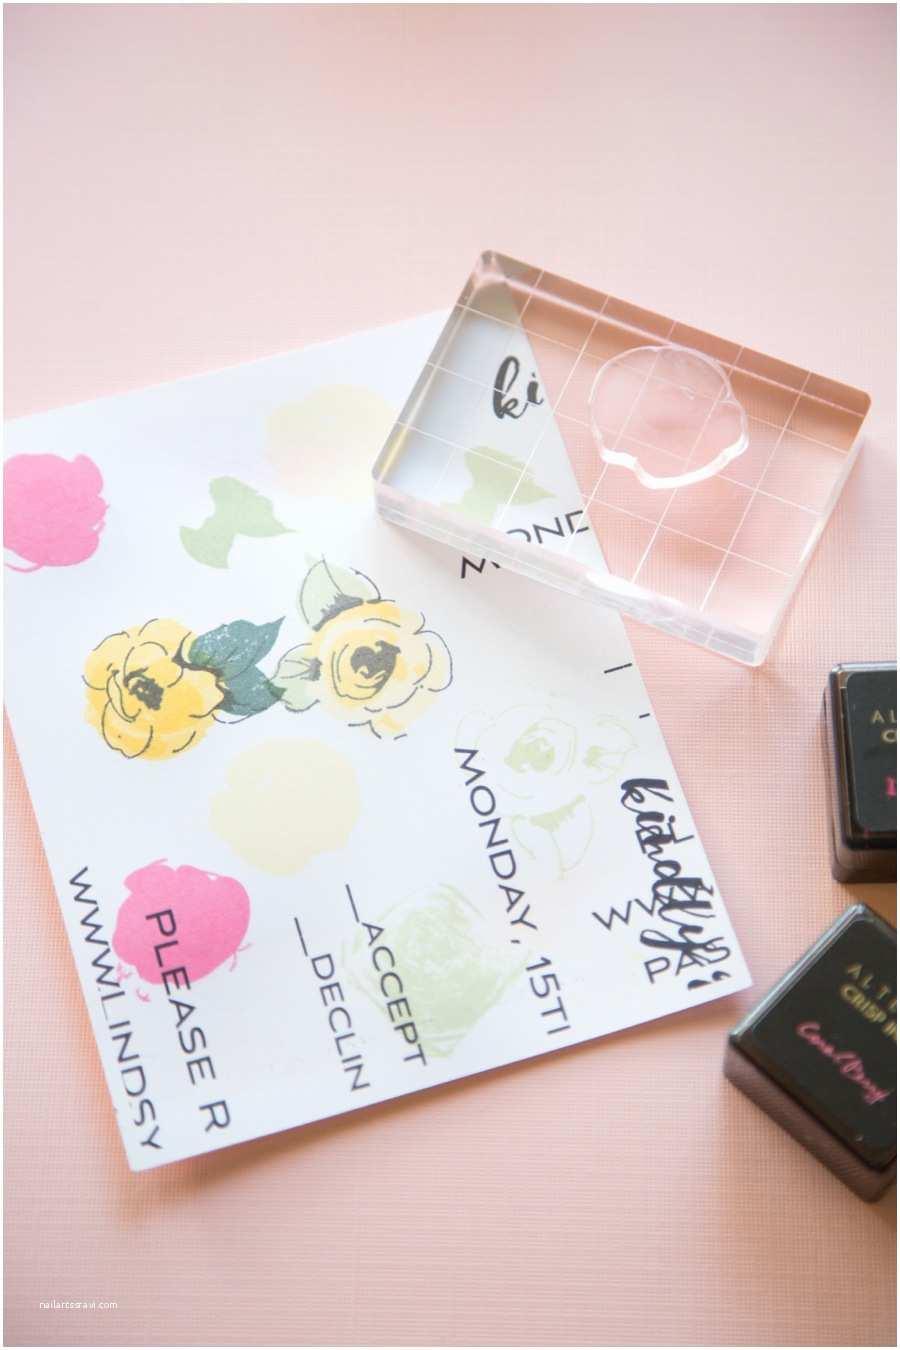 Wholesale Wedding Invitation Kits Tips Diy Wedding Invitation Kits Free with Looking Design